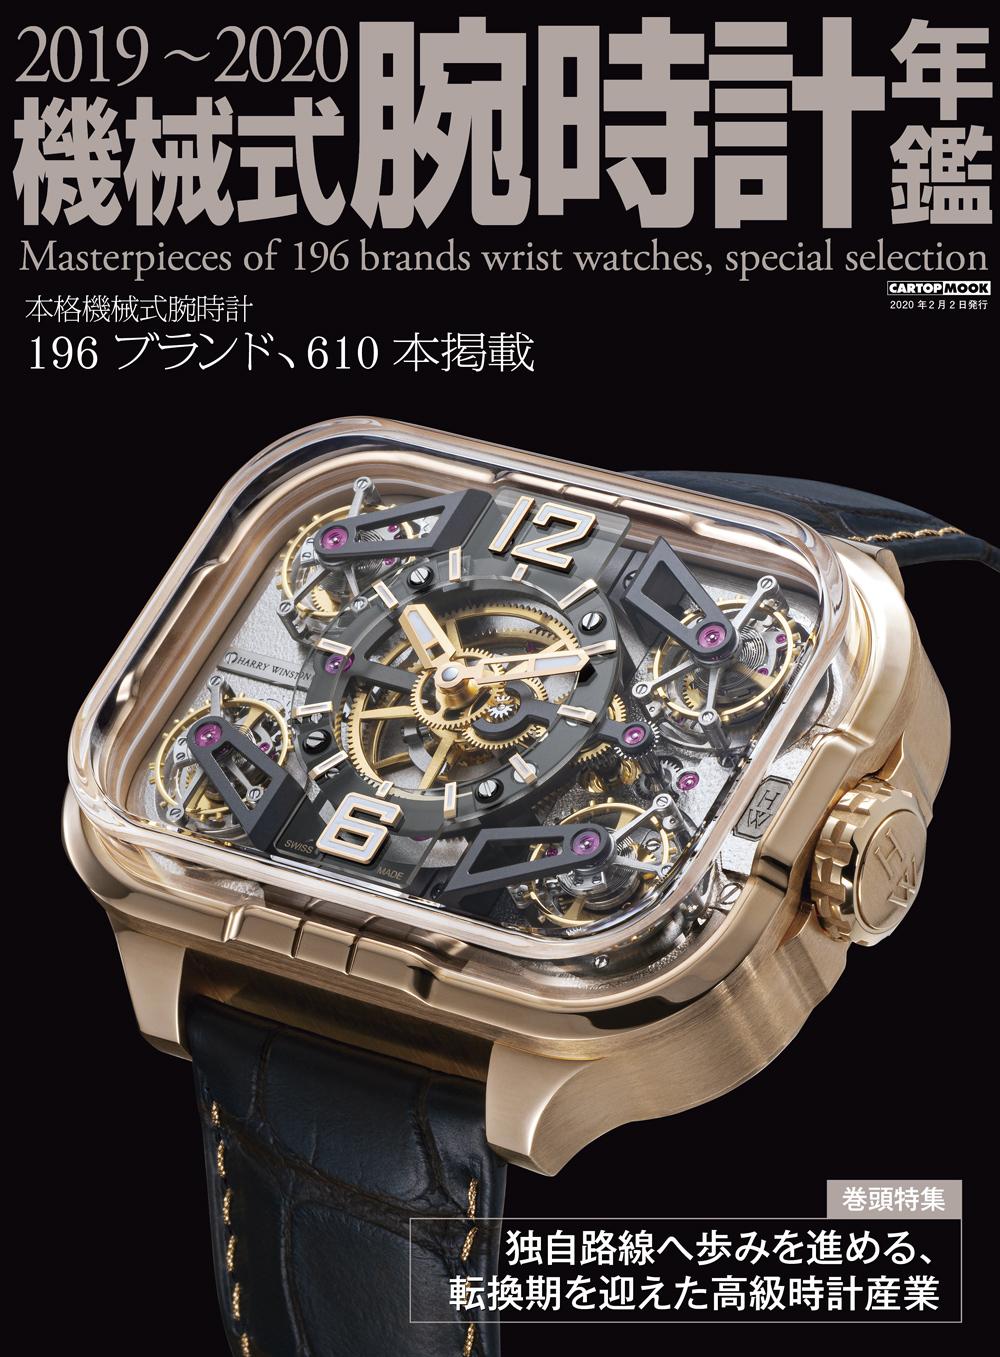 C's-Factory|電子書籍|2019~2020機械式腕時計年鑑